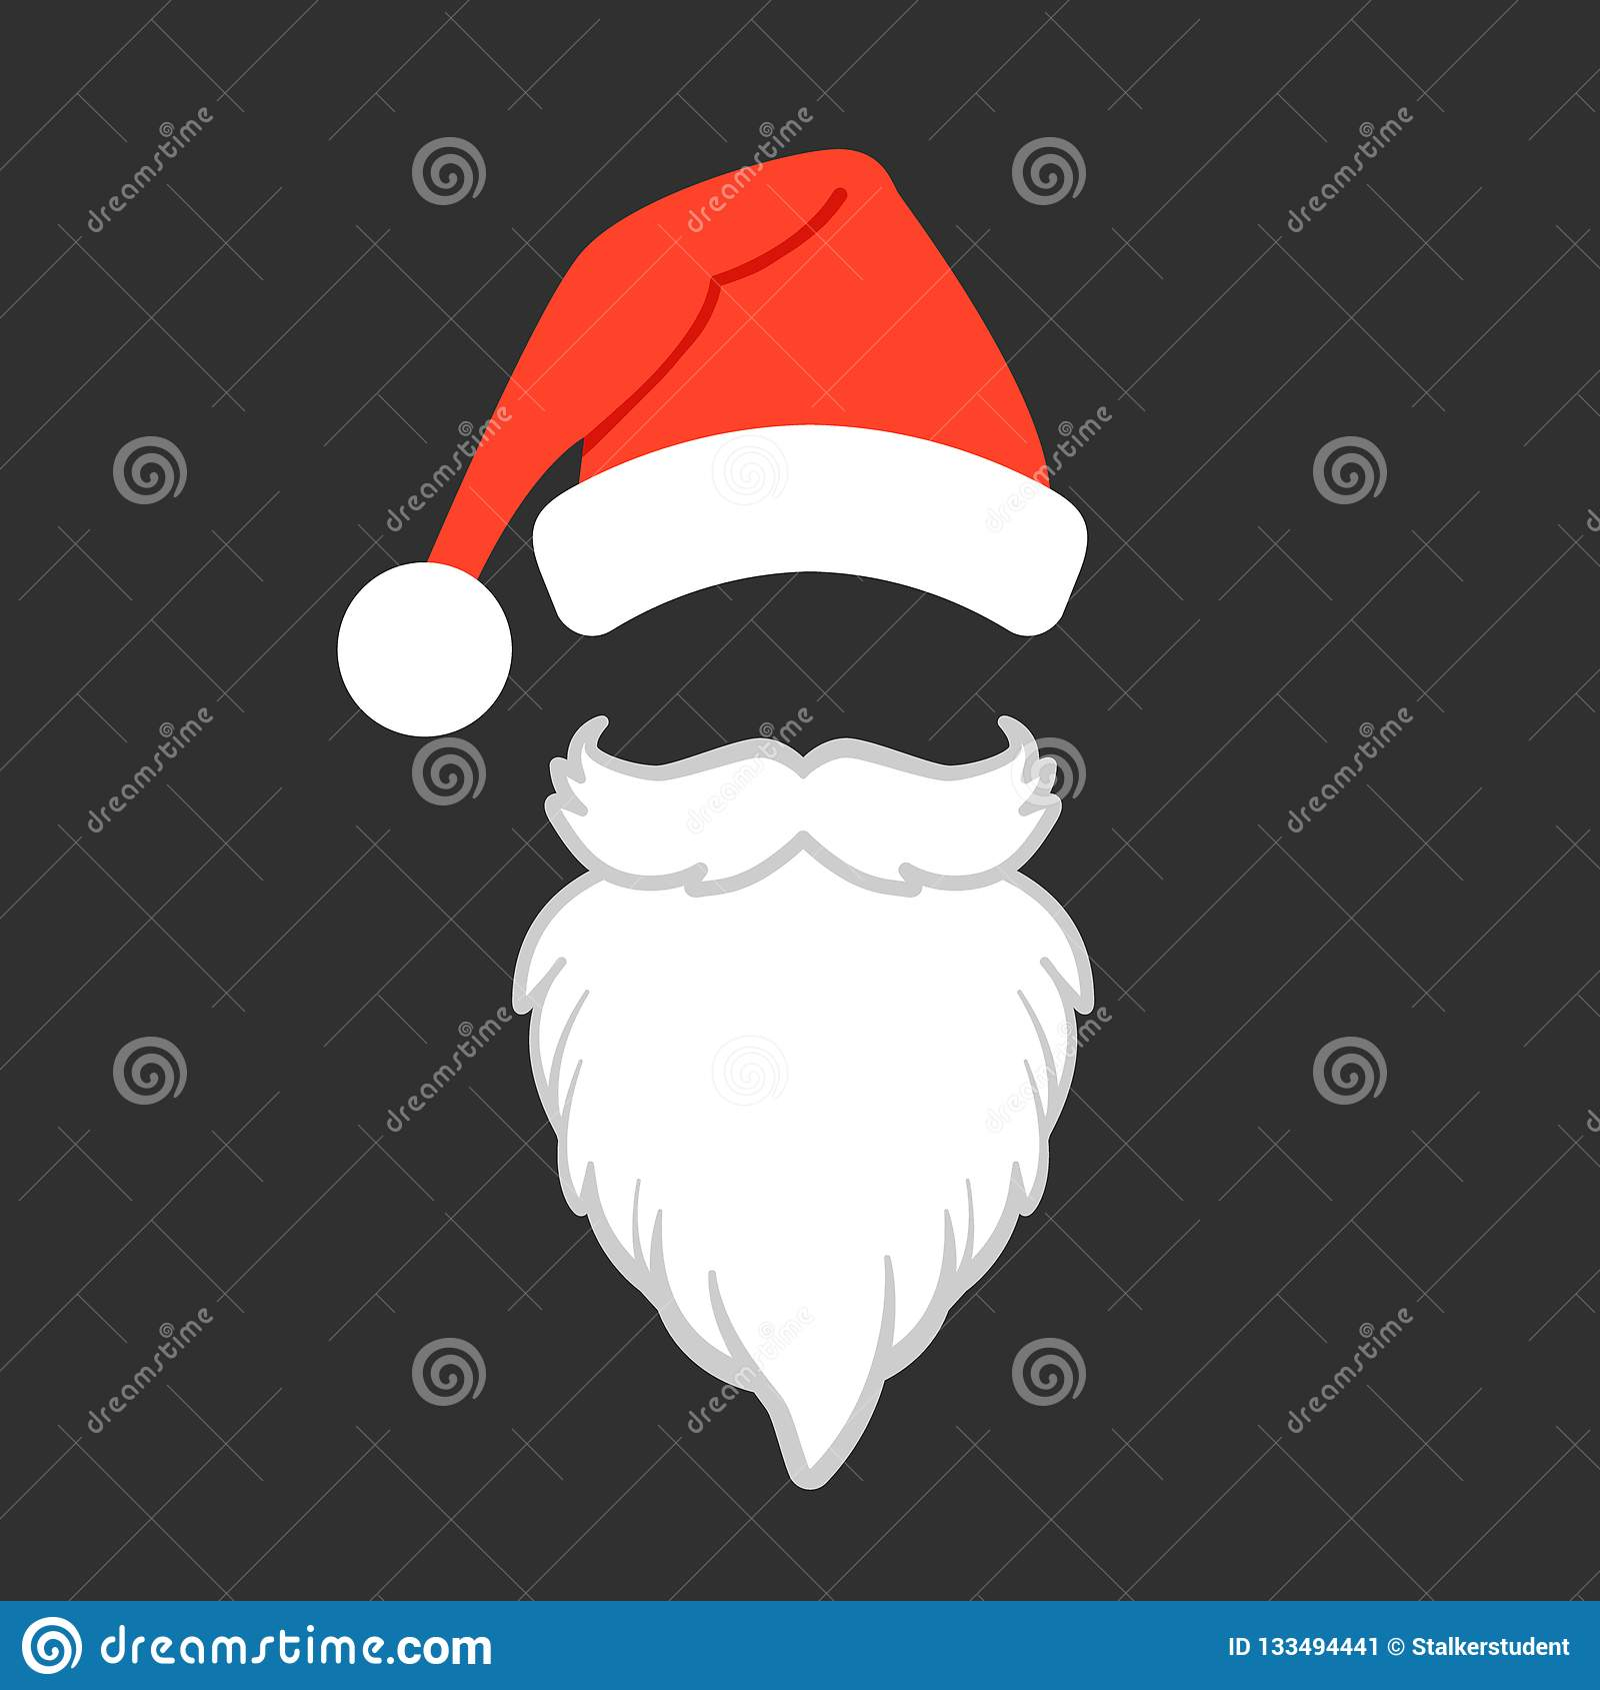 74504ac034ca1 Santa Claus Hat And Beard. Santa Claus Vector Illustration. Stock ...